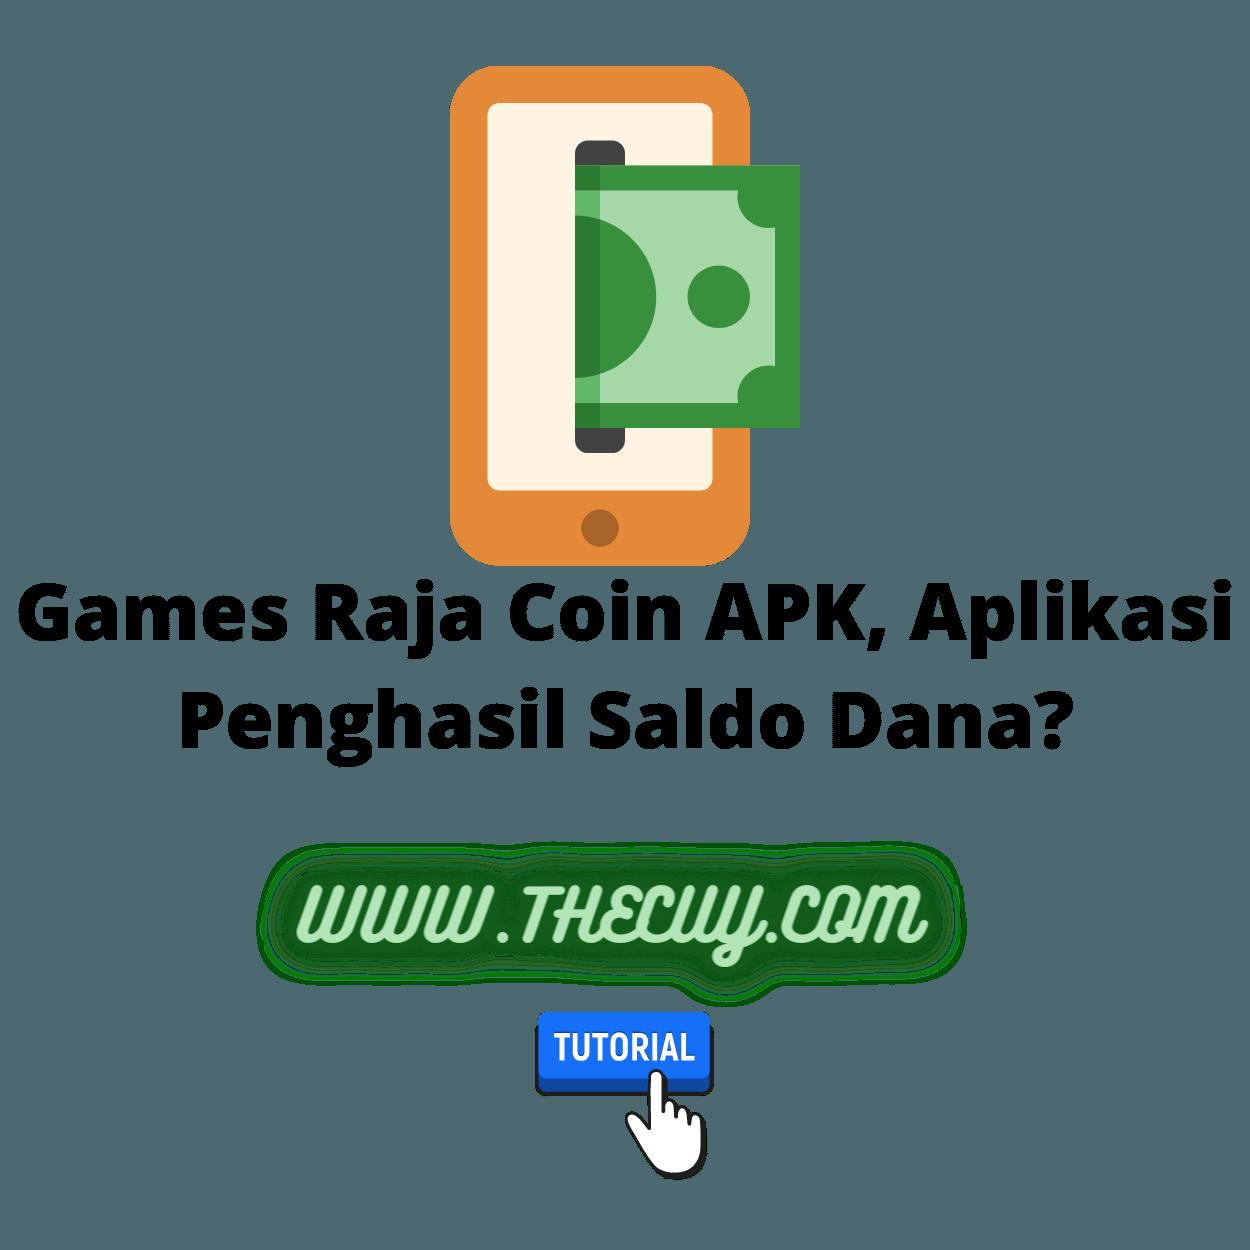 Games Raja Coin APK, Aplikasi Penghasil Saldo Dana?